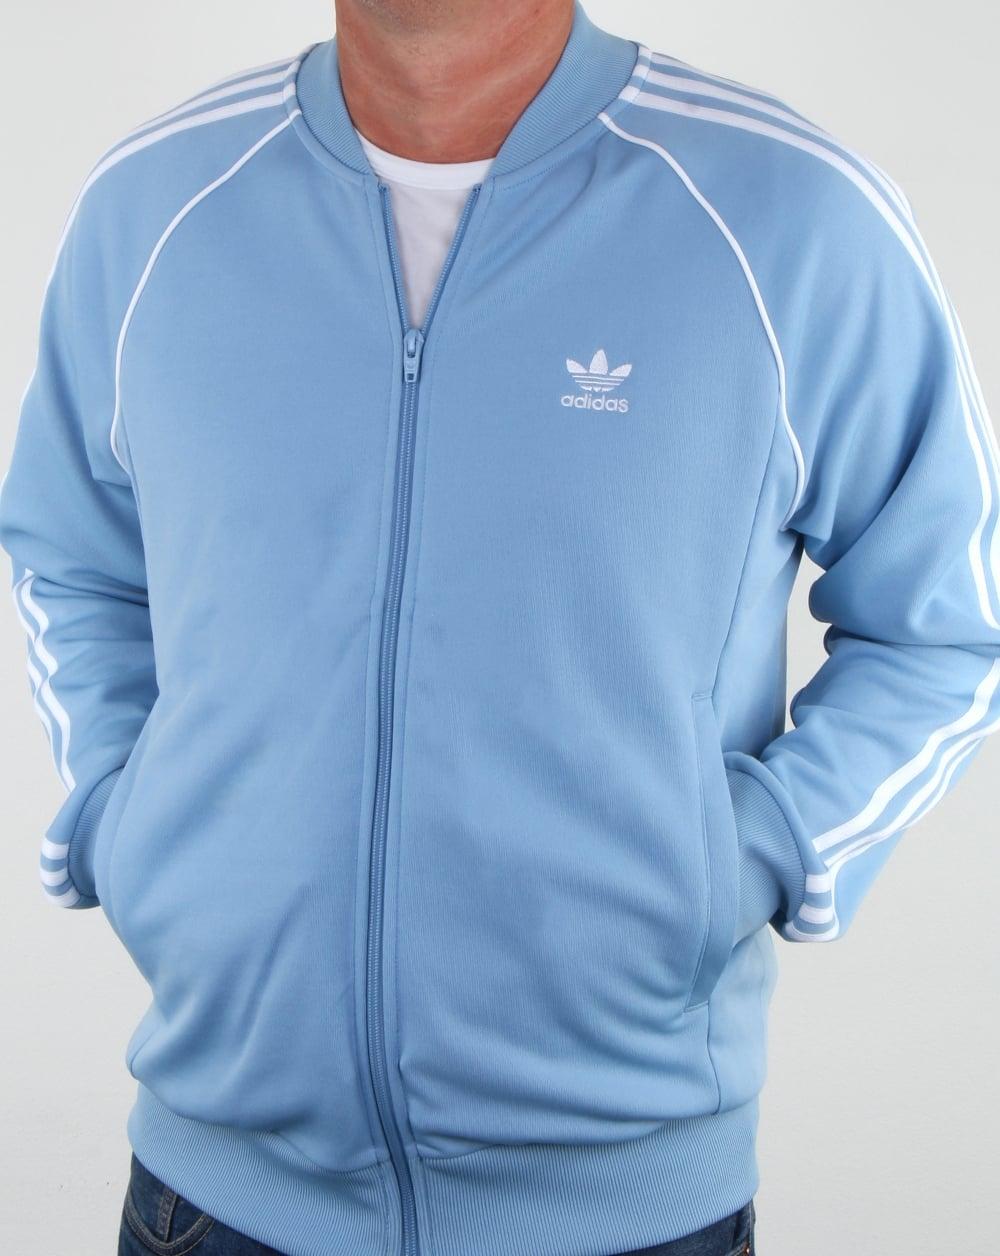 Adidas Originals Superstar Track Top Sky Jacket Tracksuit